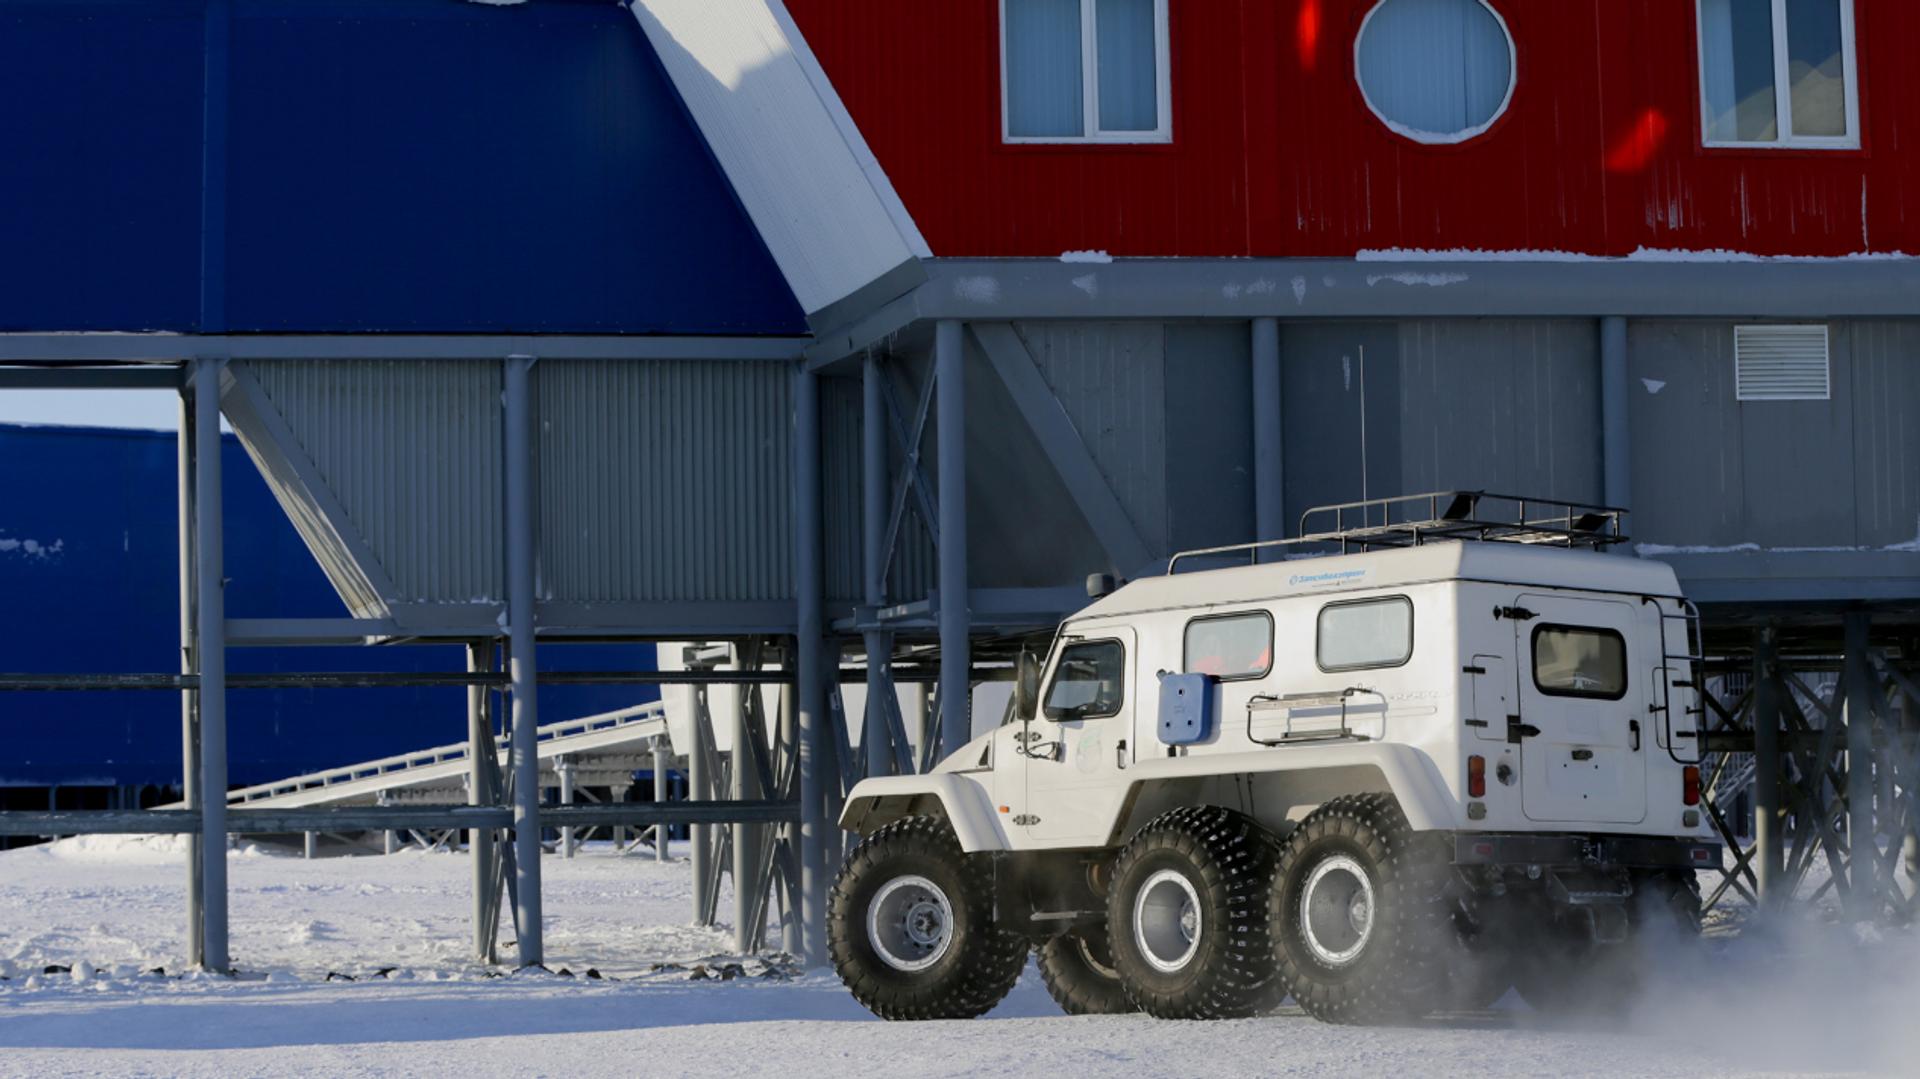 La base rusa Trébol Ártico - Sputnik Mundo, 1920, 09.04.2021